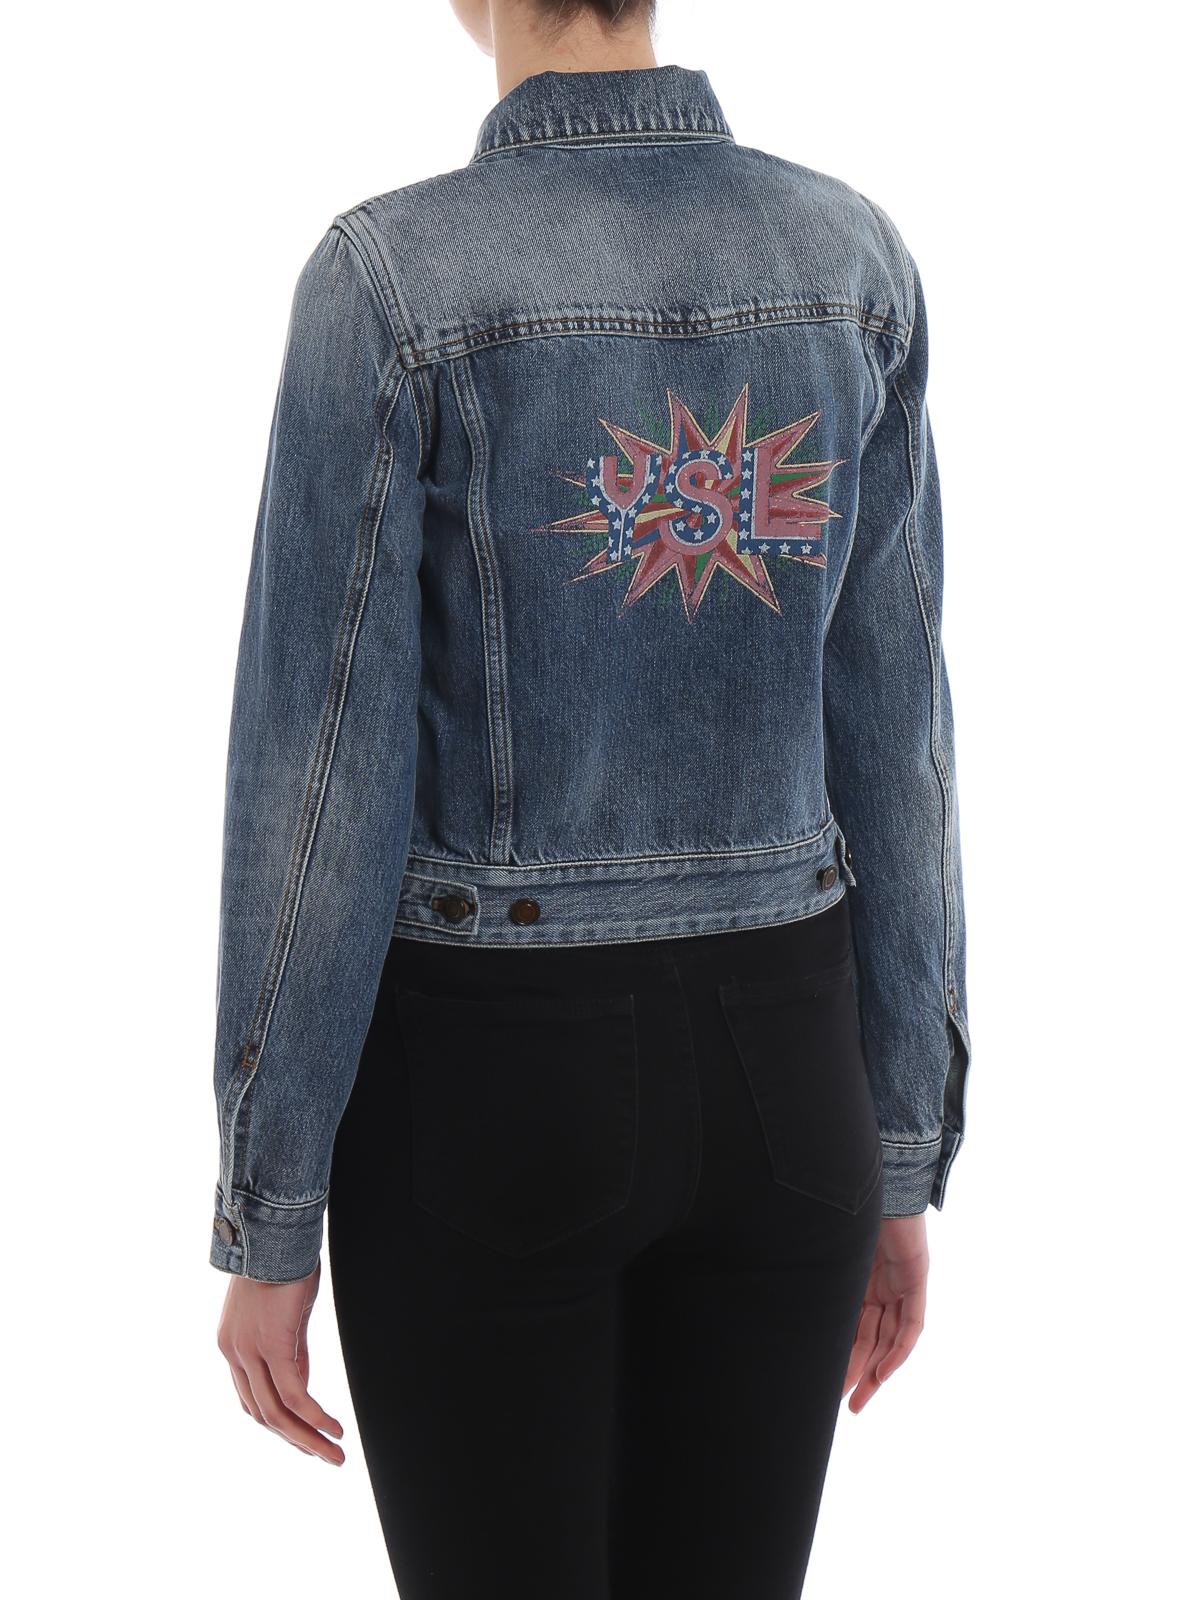 613699715a7 Saint Laurent - Denim jacket with rear ysl print - denim jacket ...